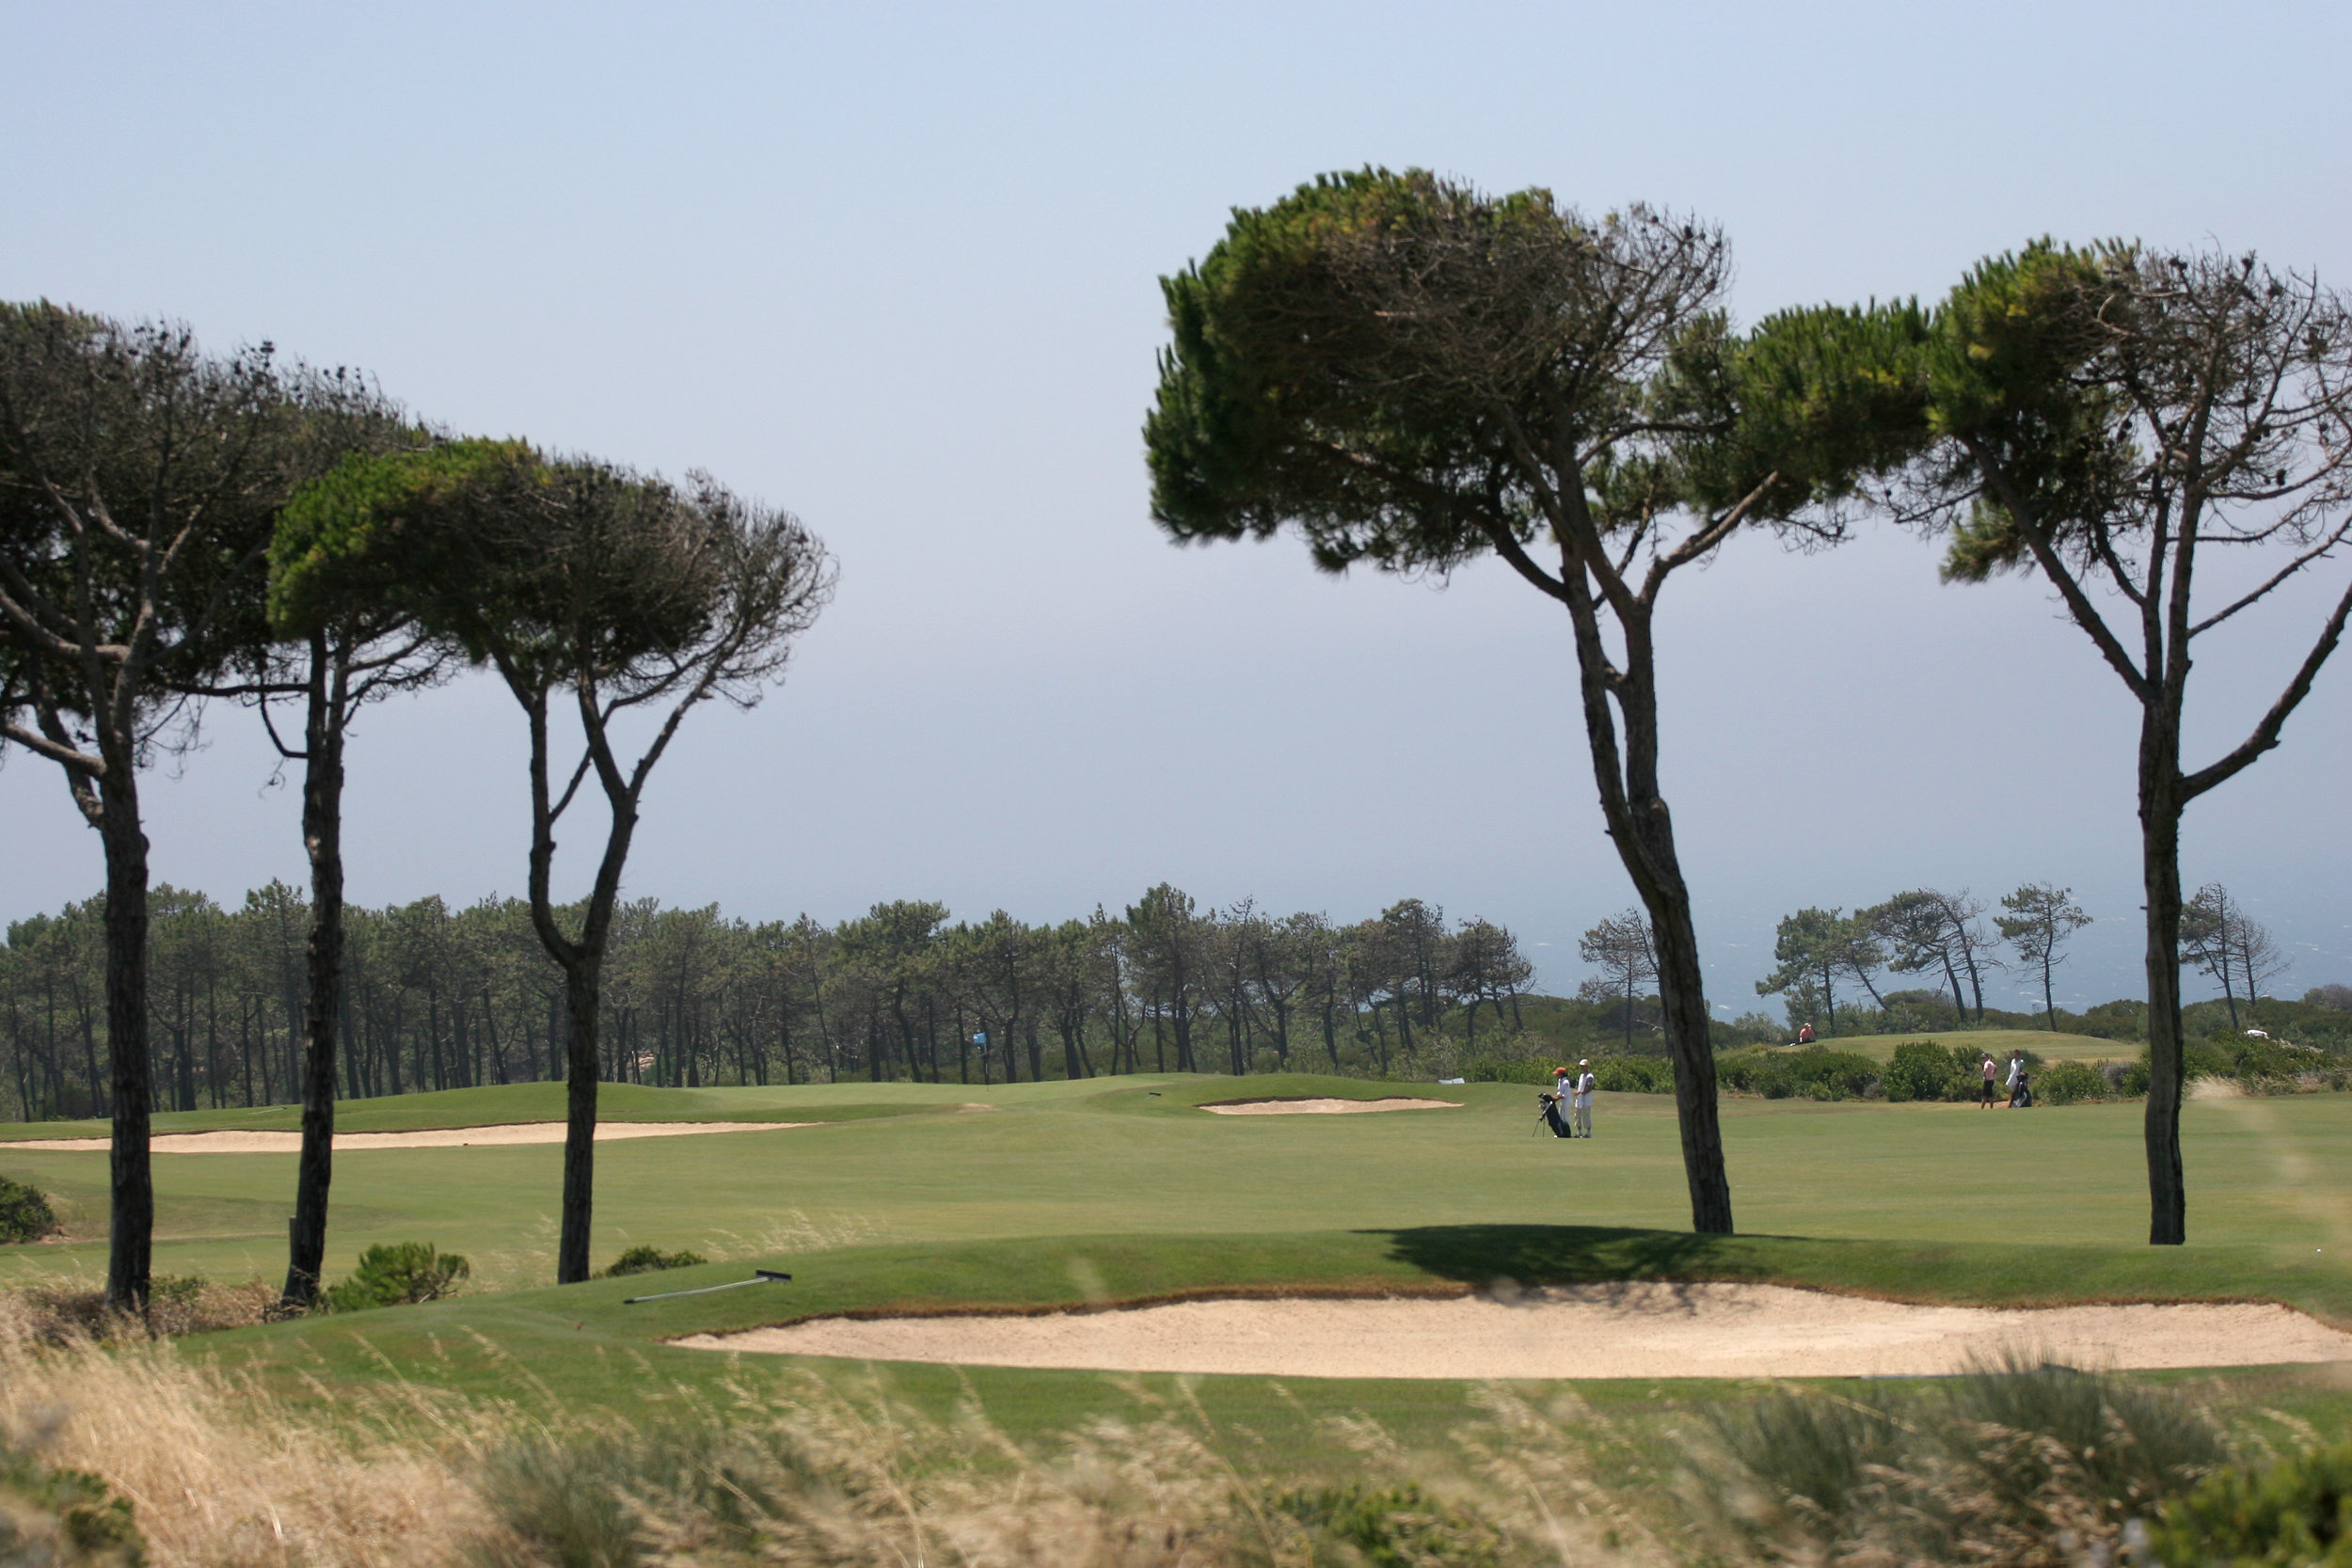 portugal_estoril_bigstock-Oitavos-Golf-Course-Estoril--1986092.jpg